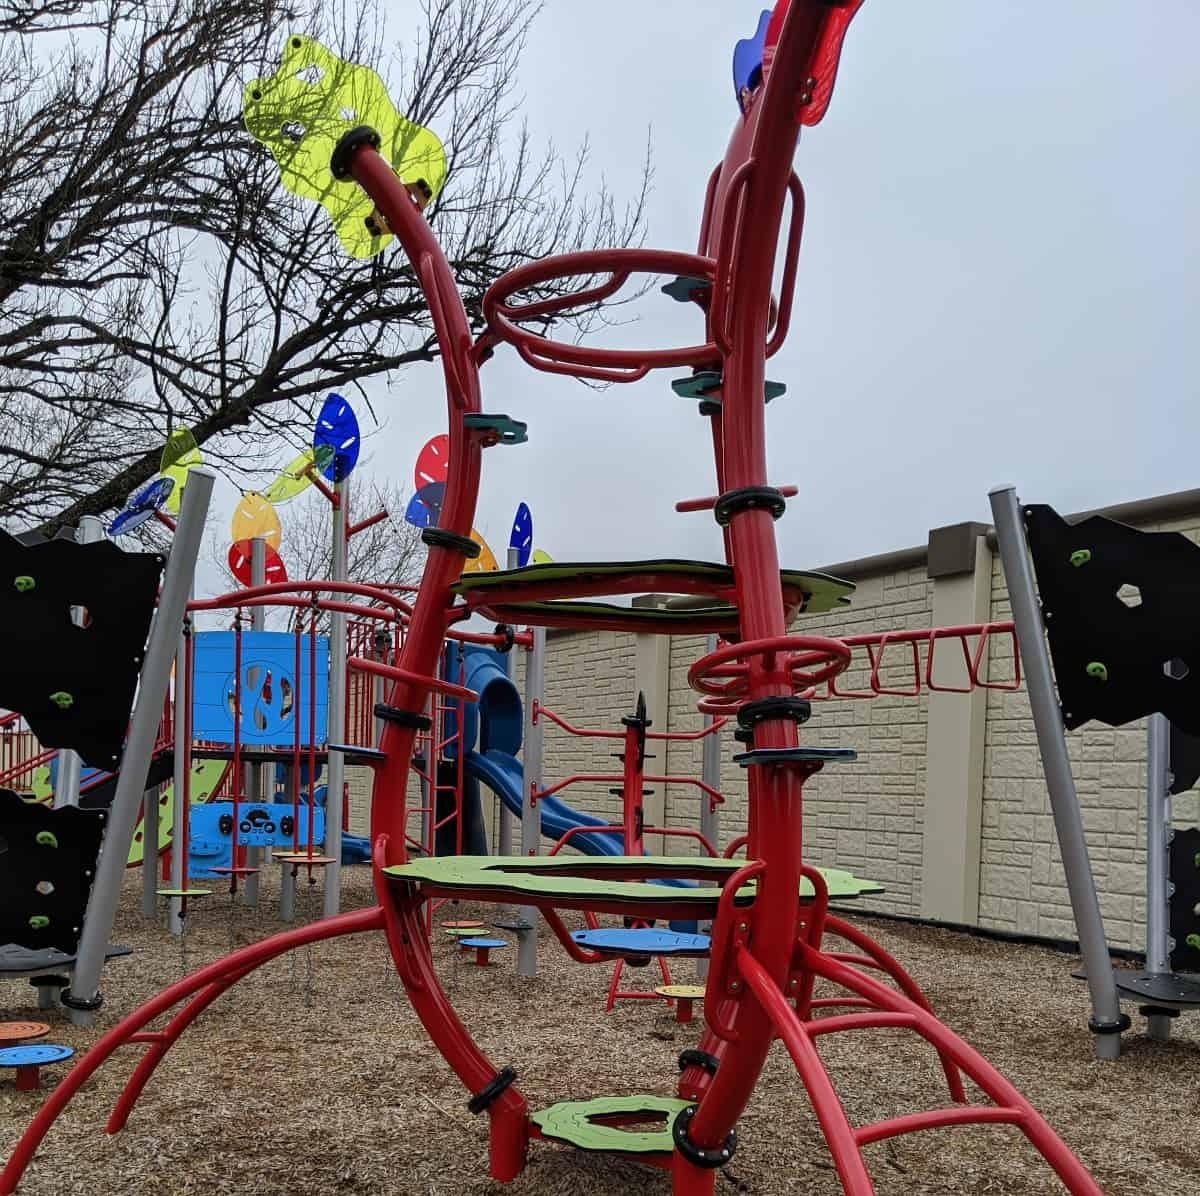 Ware Park Playground